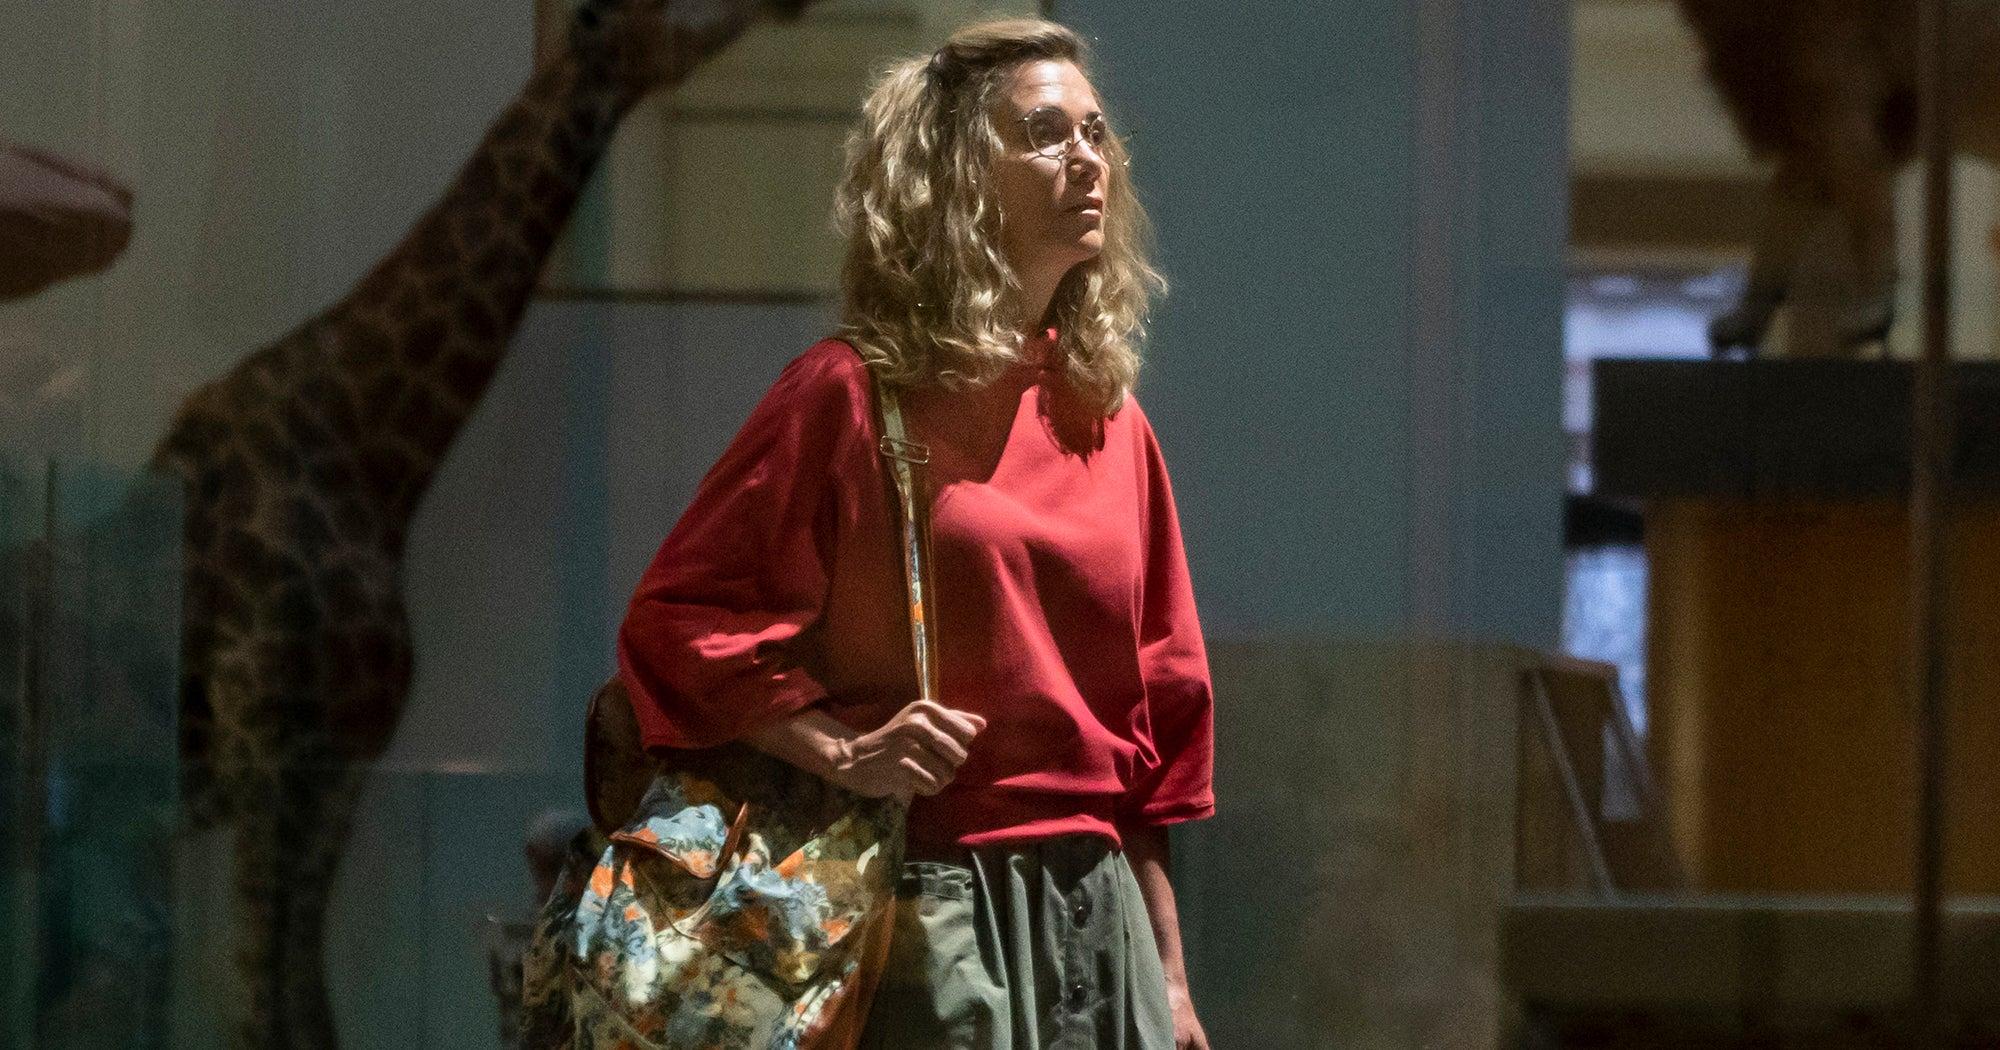 Kristen Wiig as Barbara Minerva or Cheetah